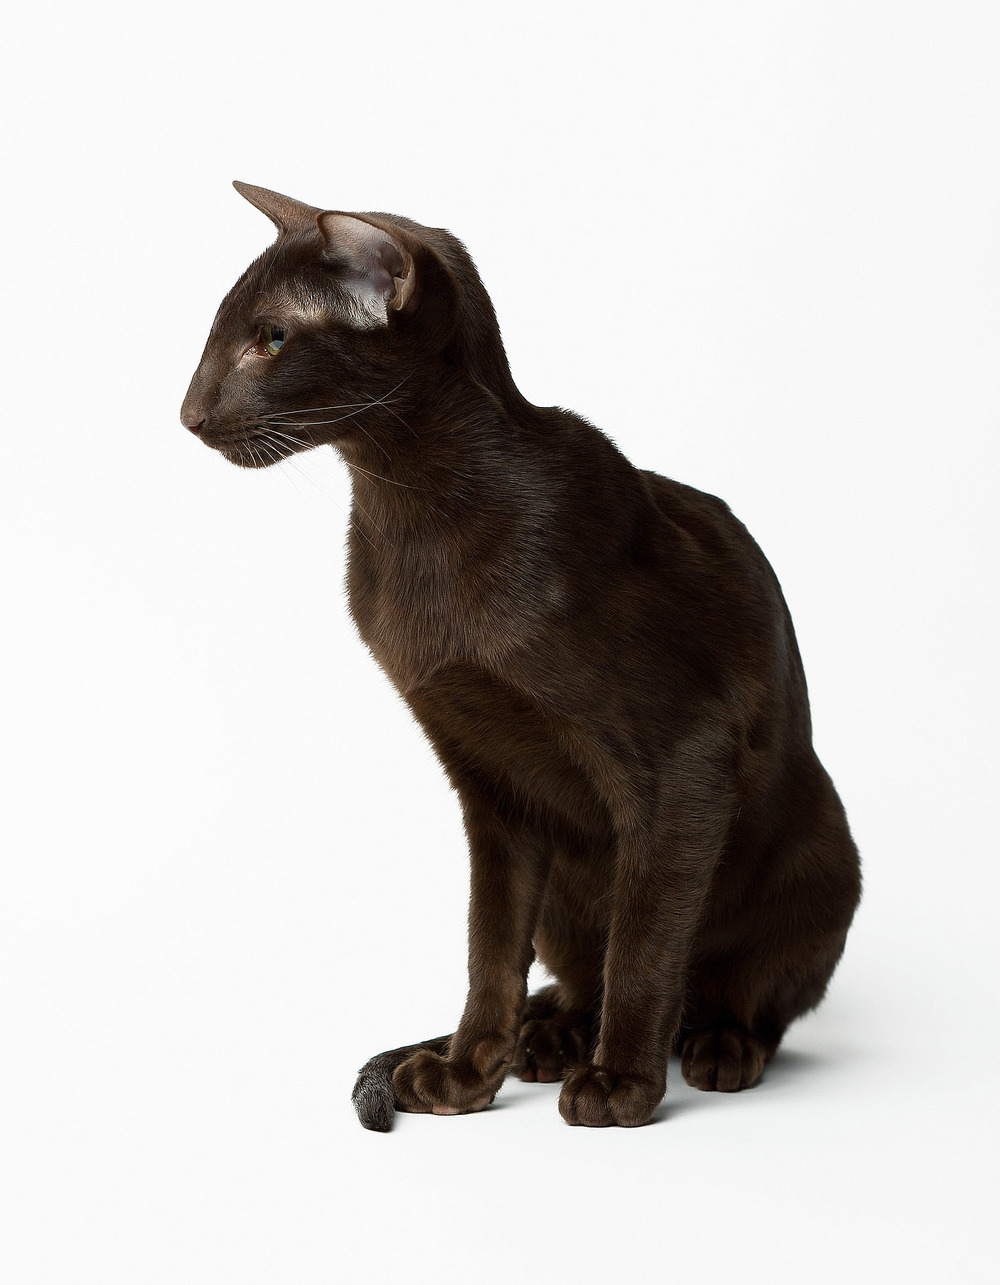 Cat_OR1A4442_28x36_1550px.JPG